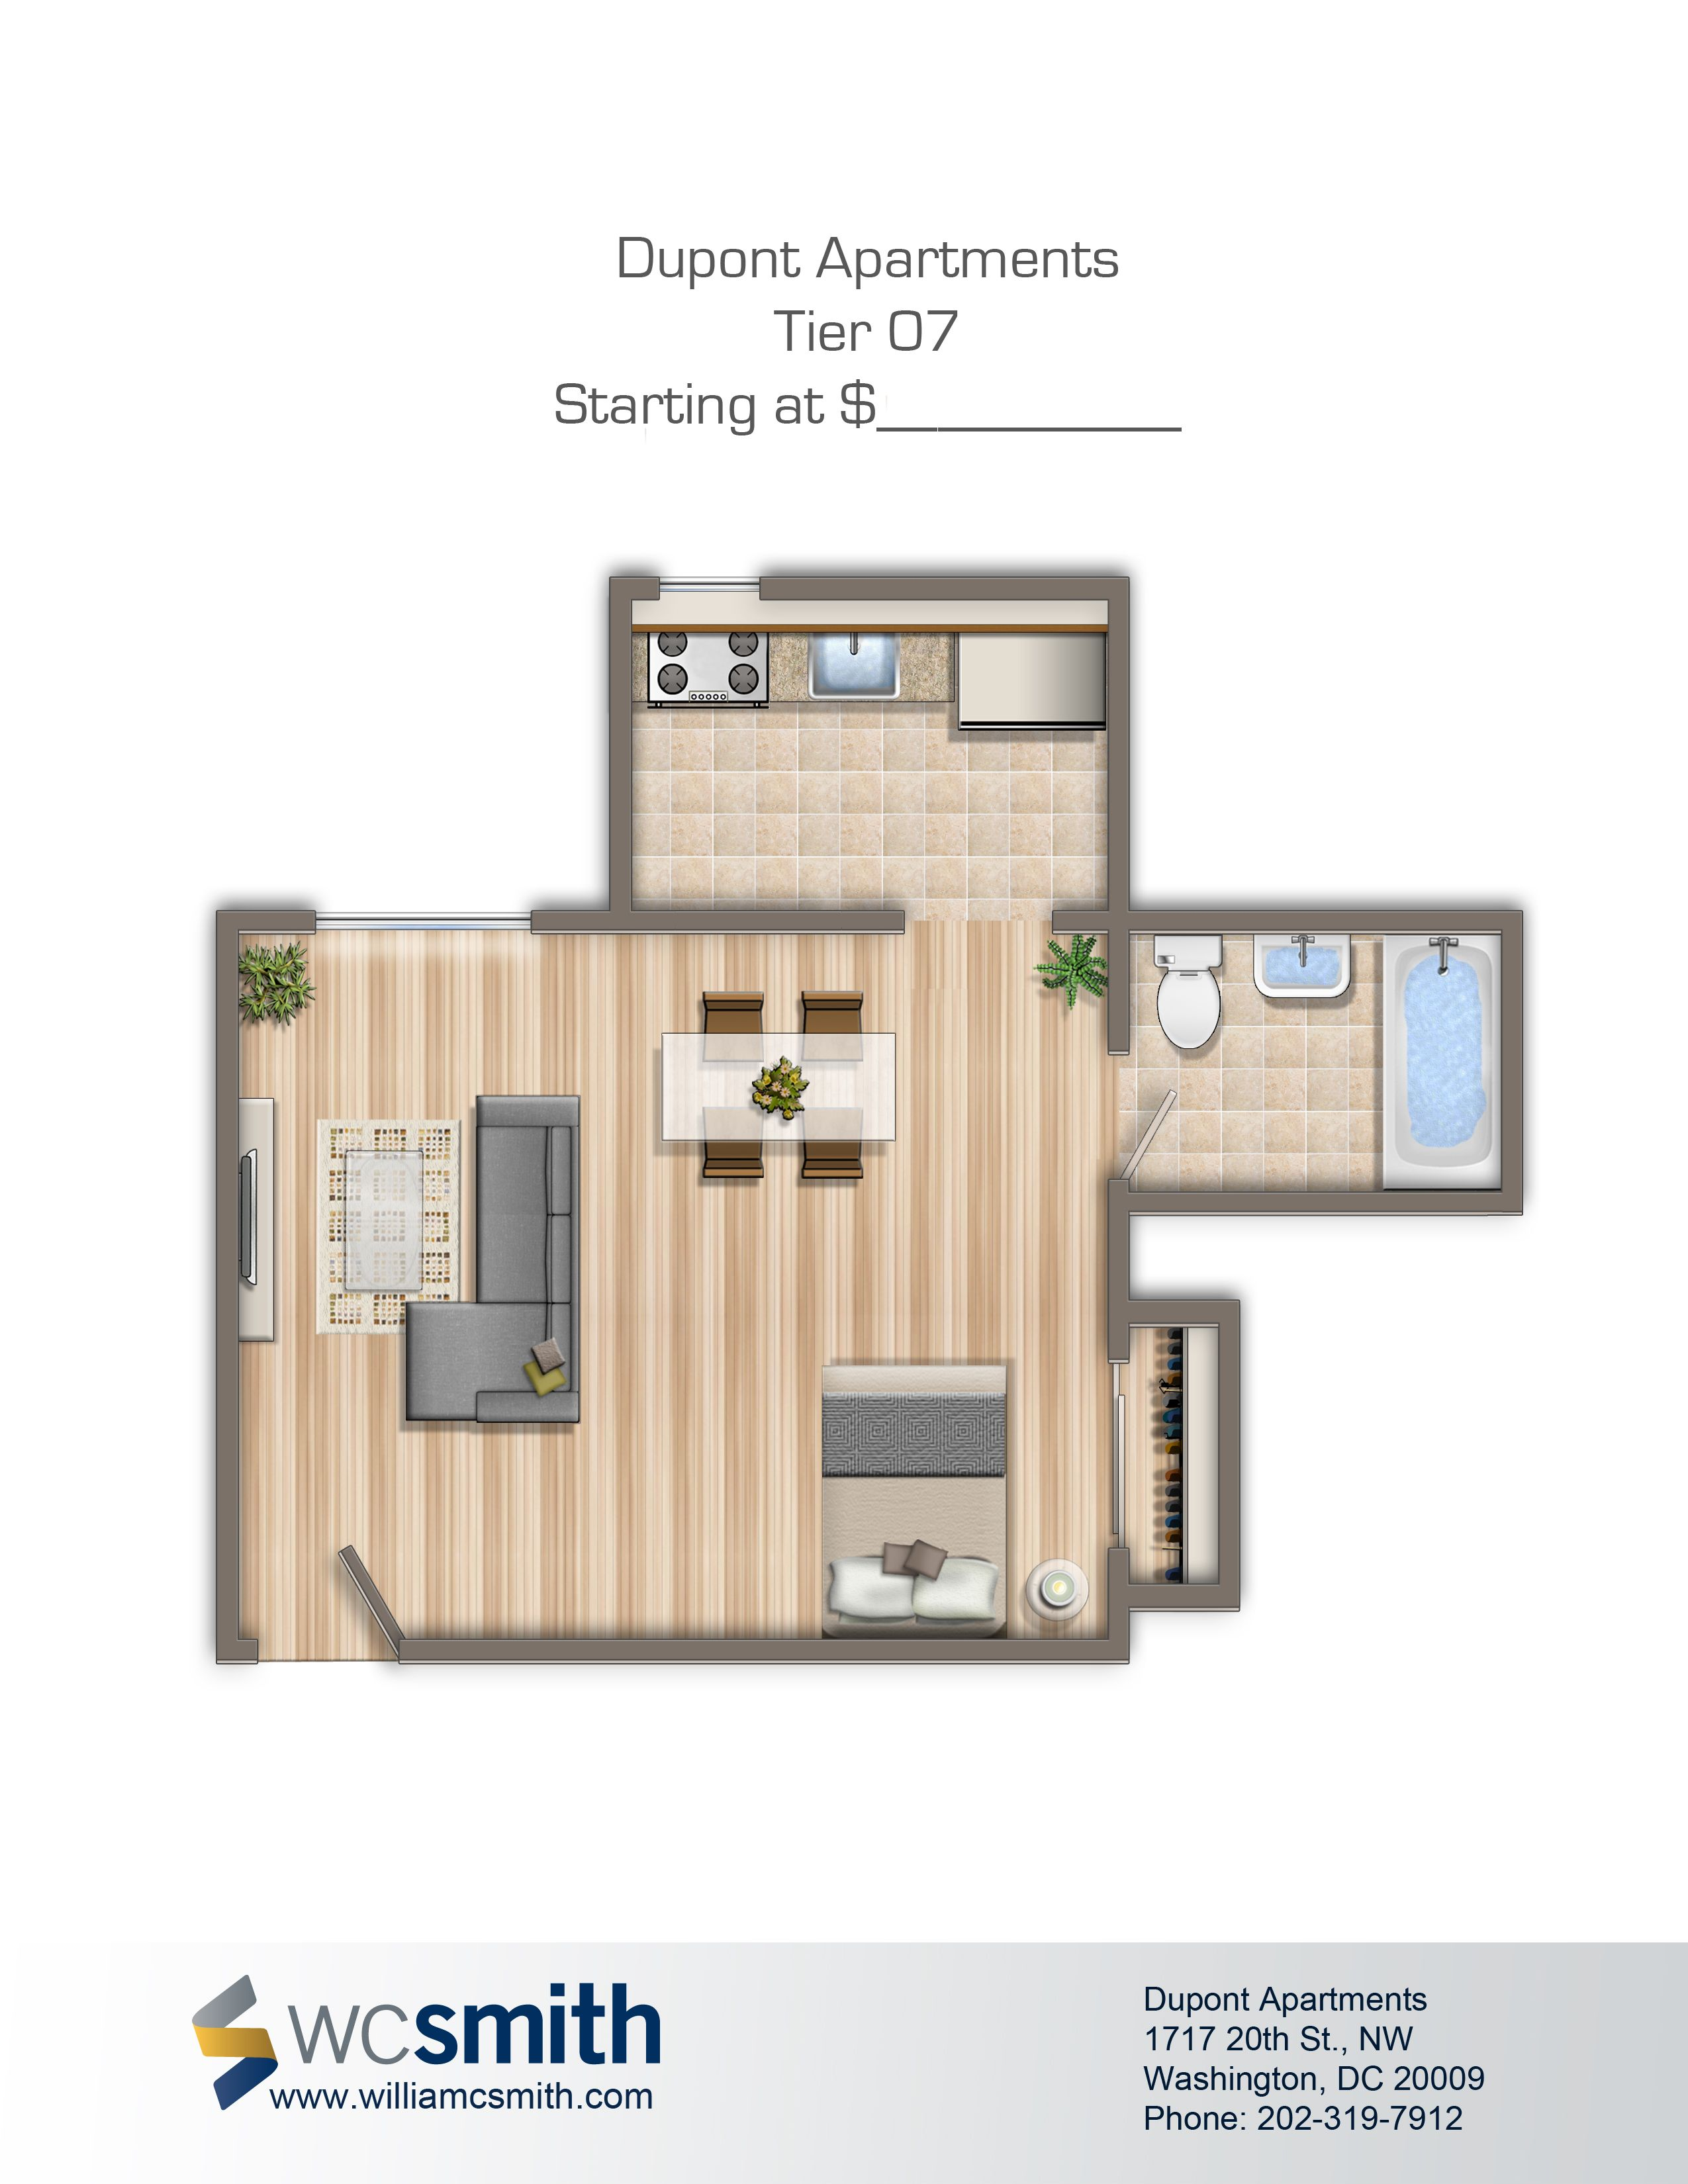 Studio/Efficiency Floor Plan | Dupont Apartments In Northwest Washington DC  | WC Smith Apartments